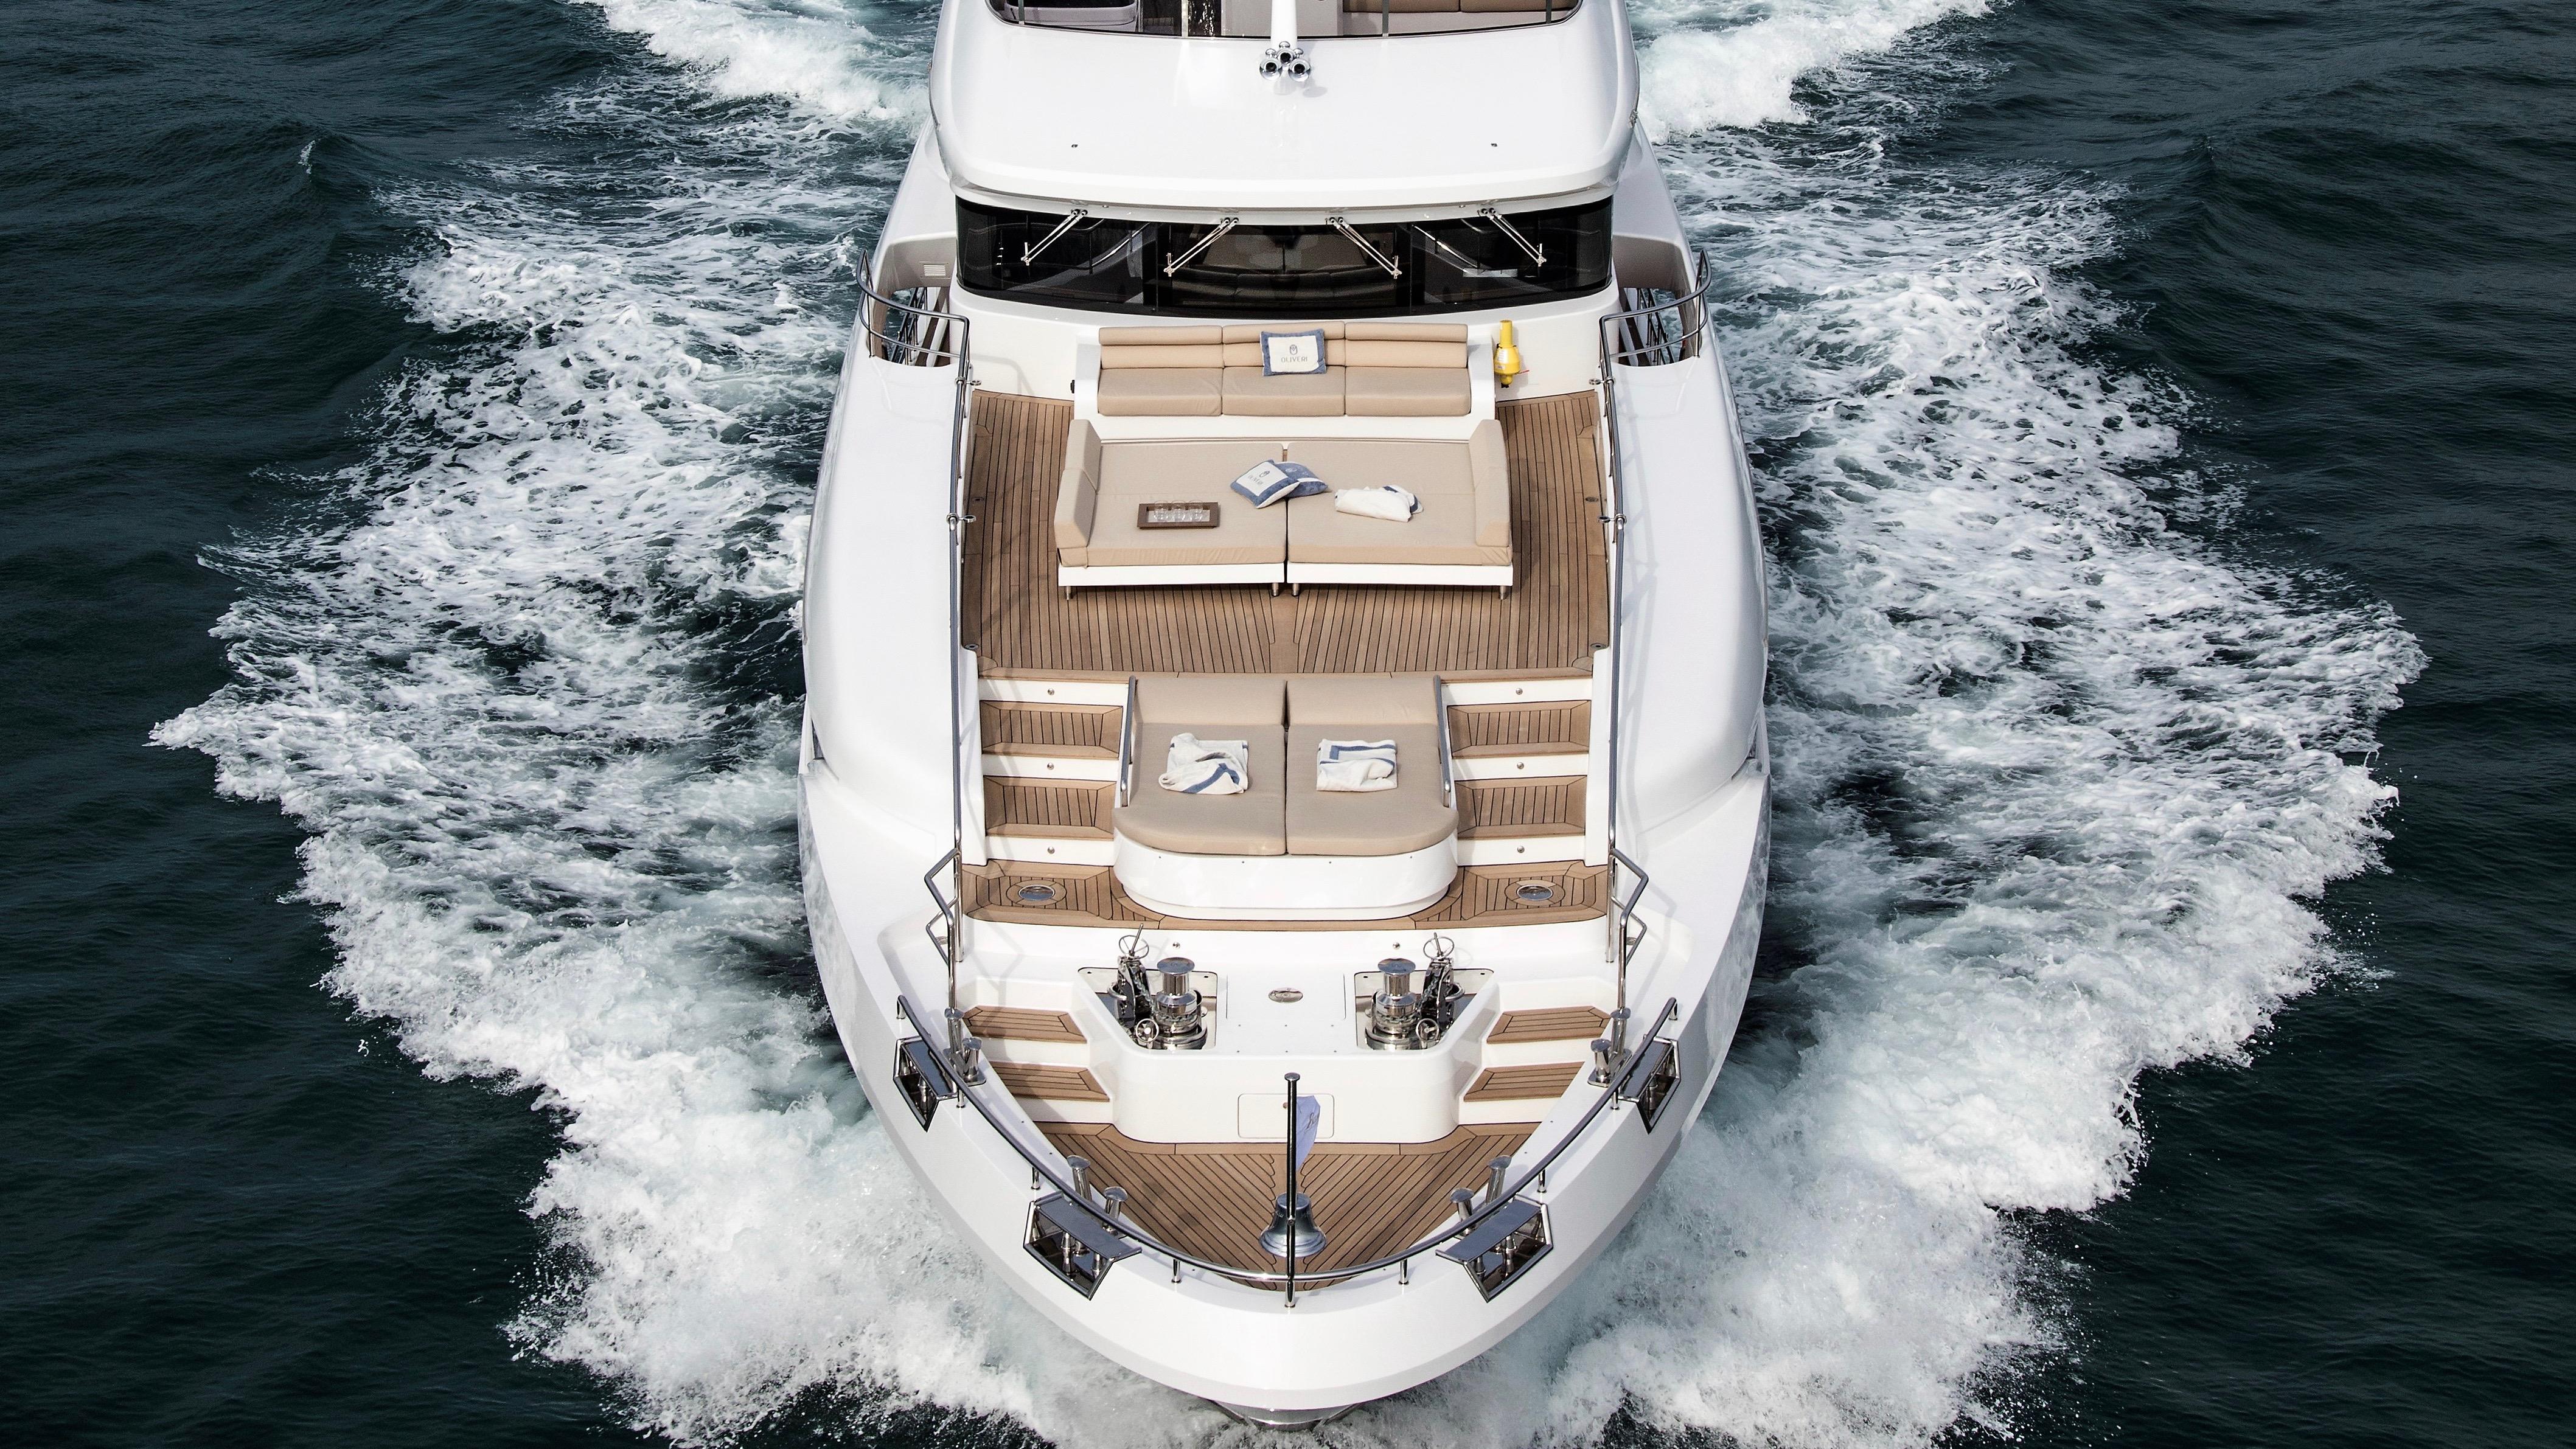 Benetti Delfino 95 superyacht Italian